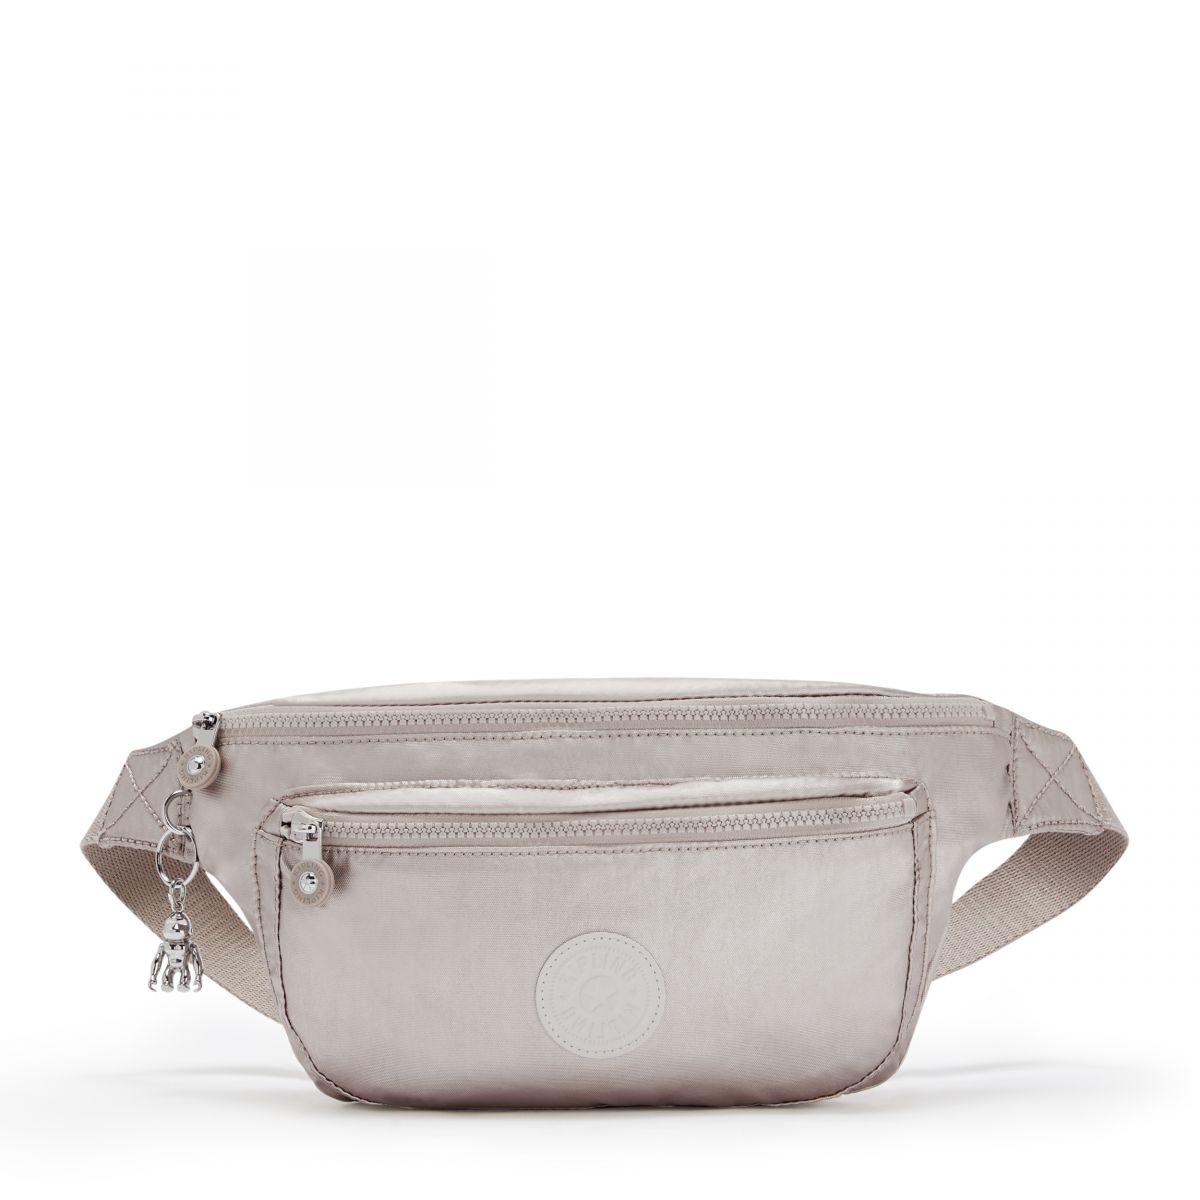 YASEMINA XL BAGS by Kipling